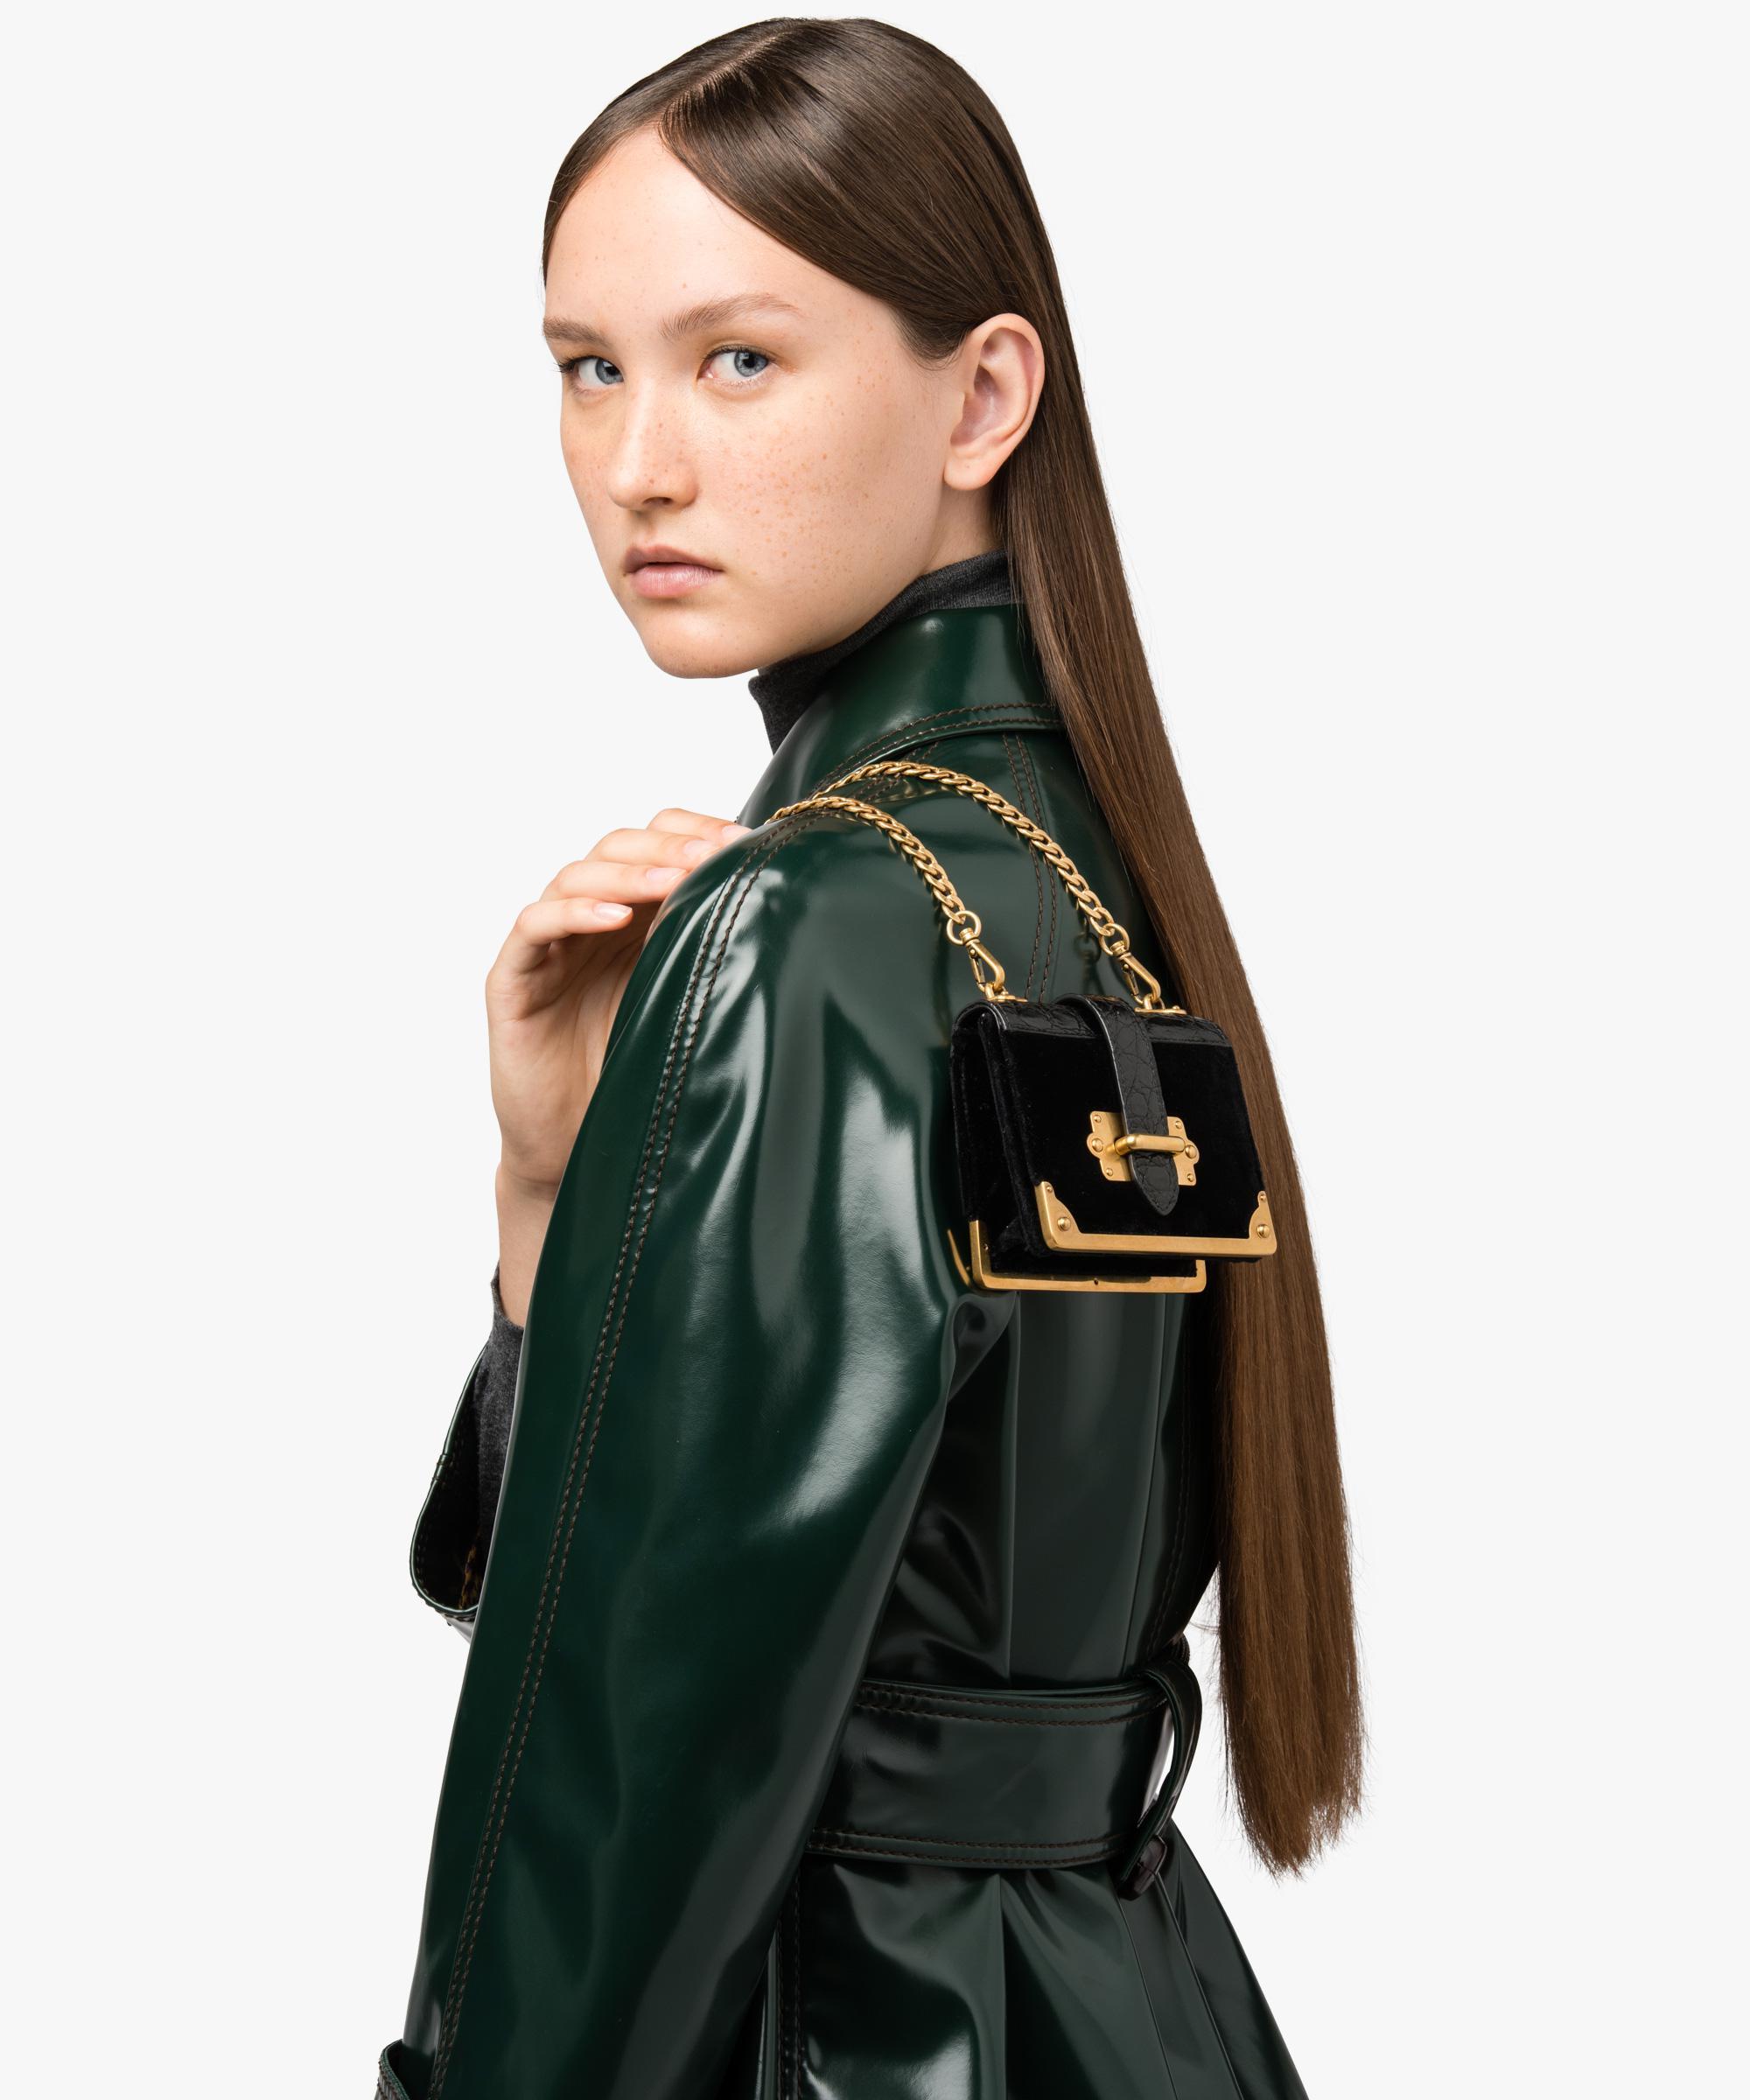 042c42f91902 Lyst - Prada Micro Cahier Bag in Black